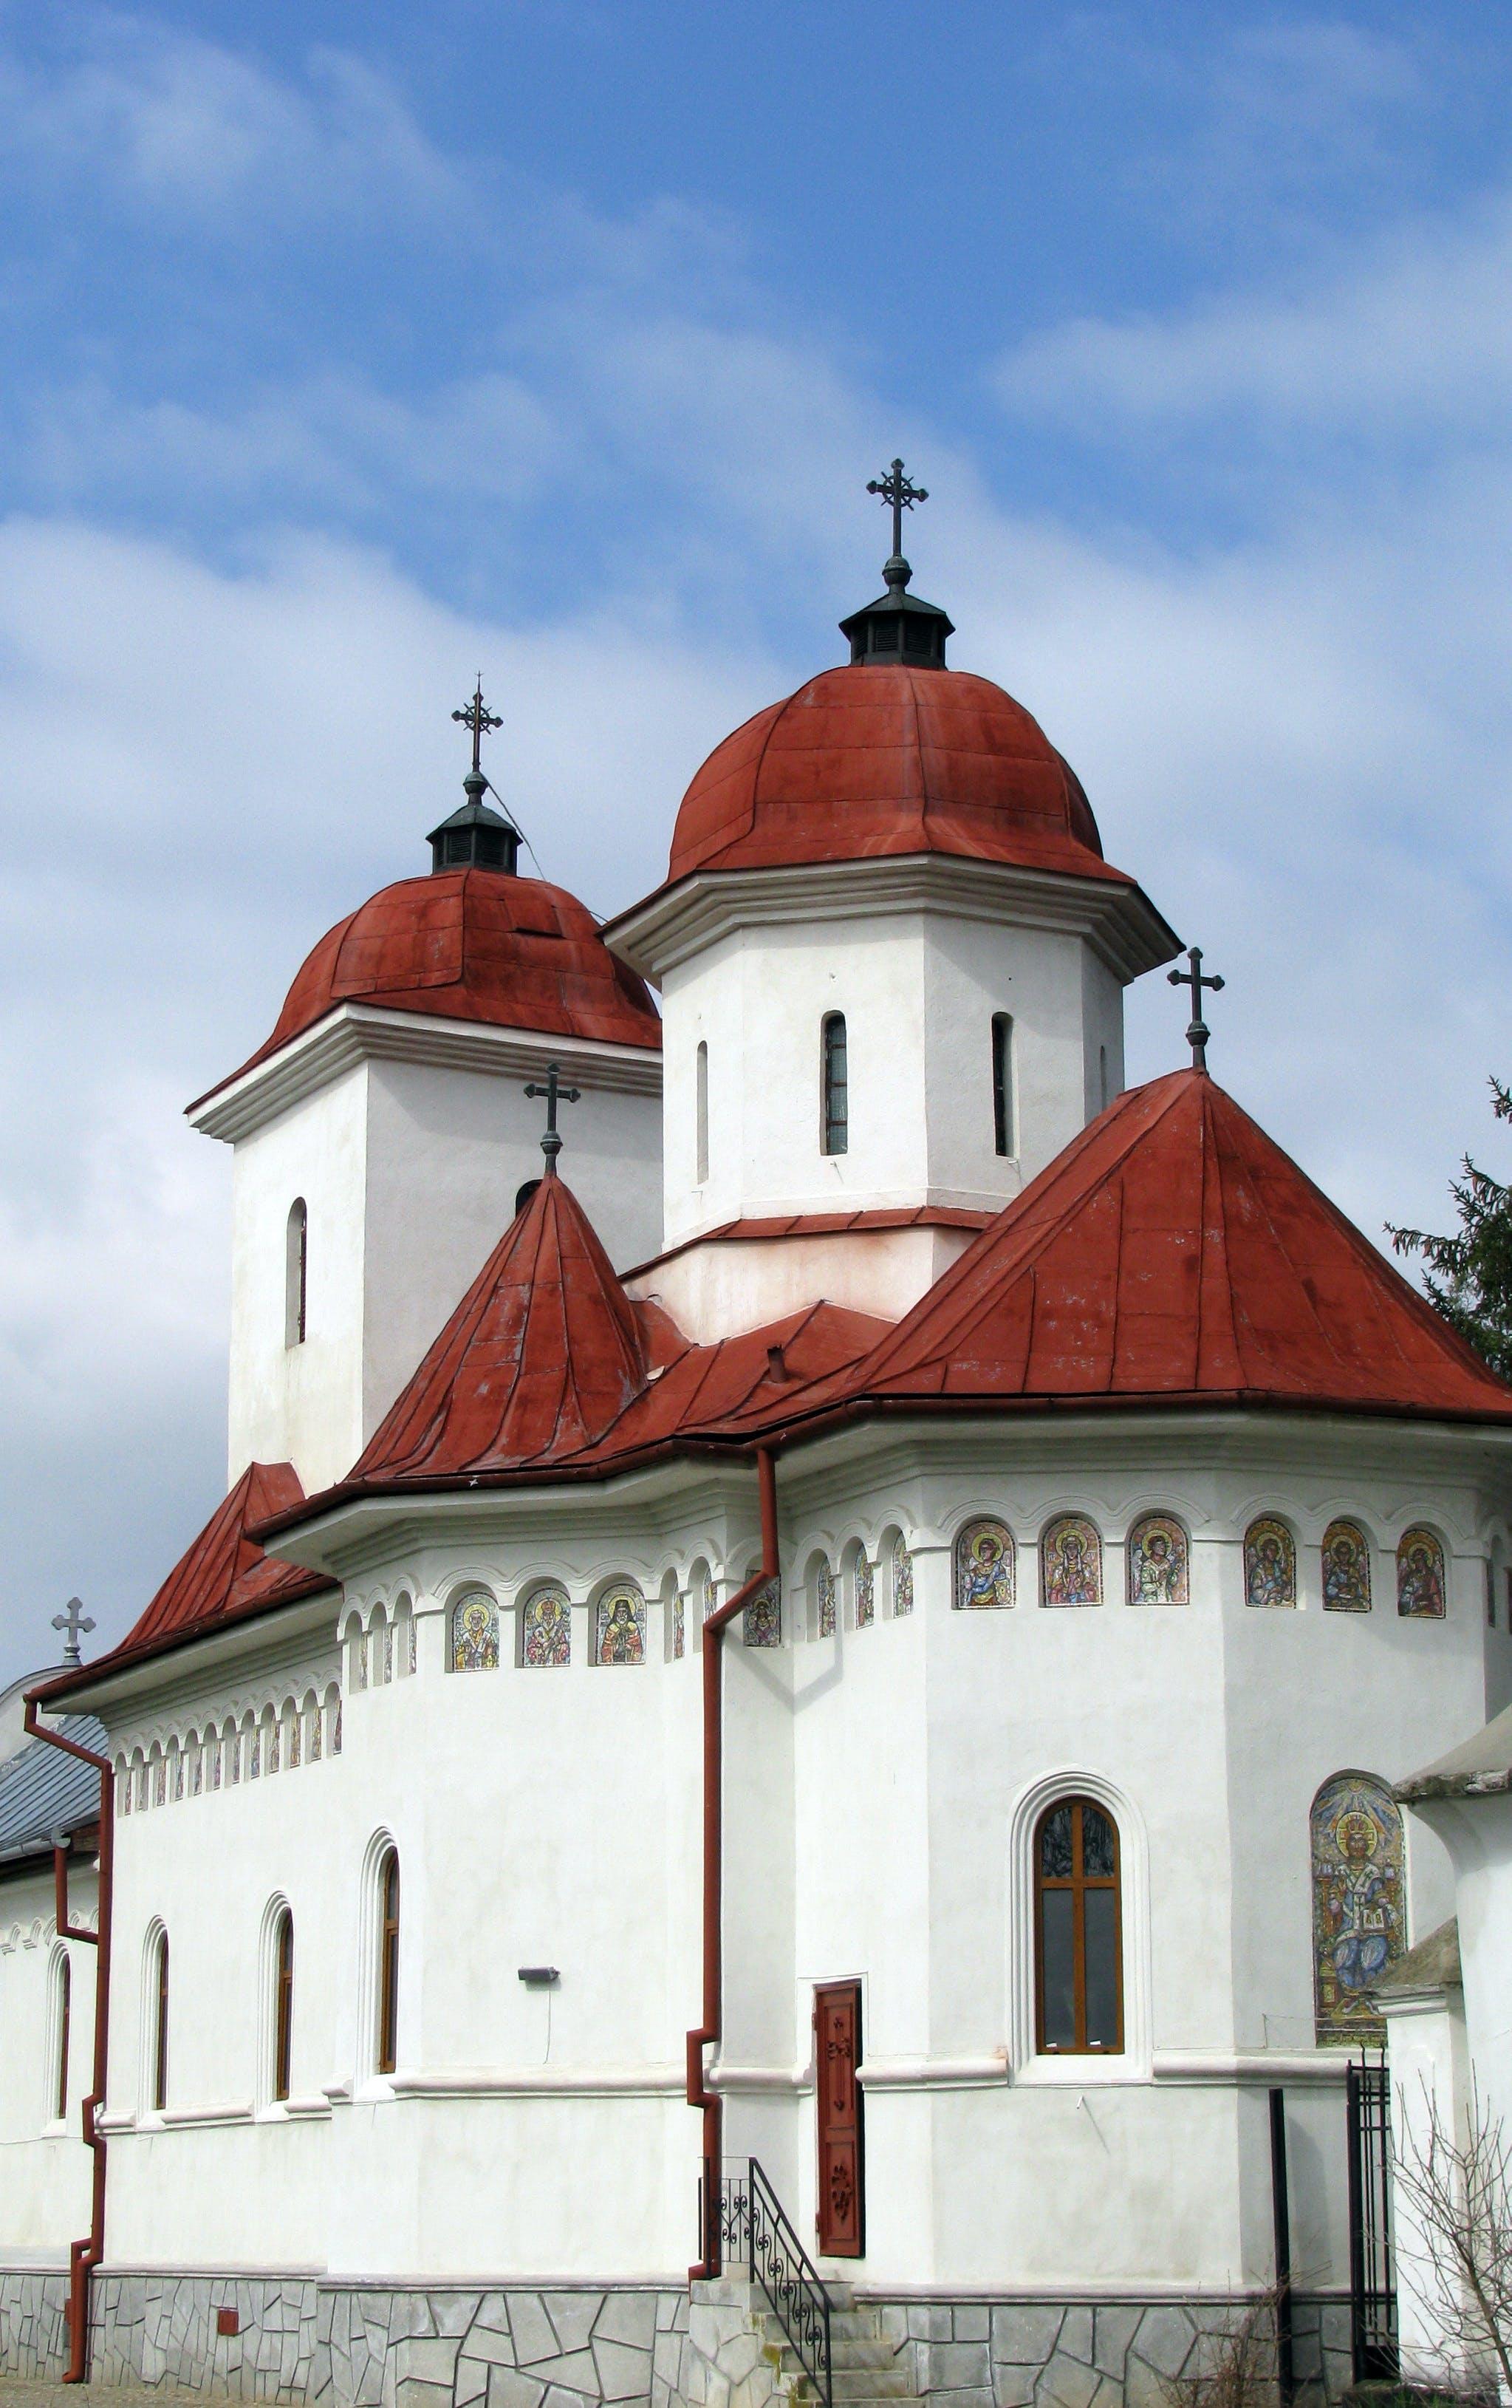 Free stock photo of church building, monastery, religion, saints